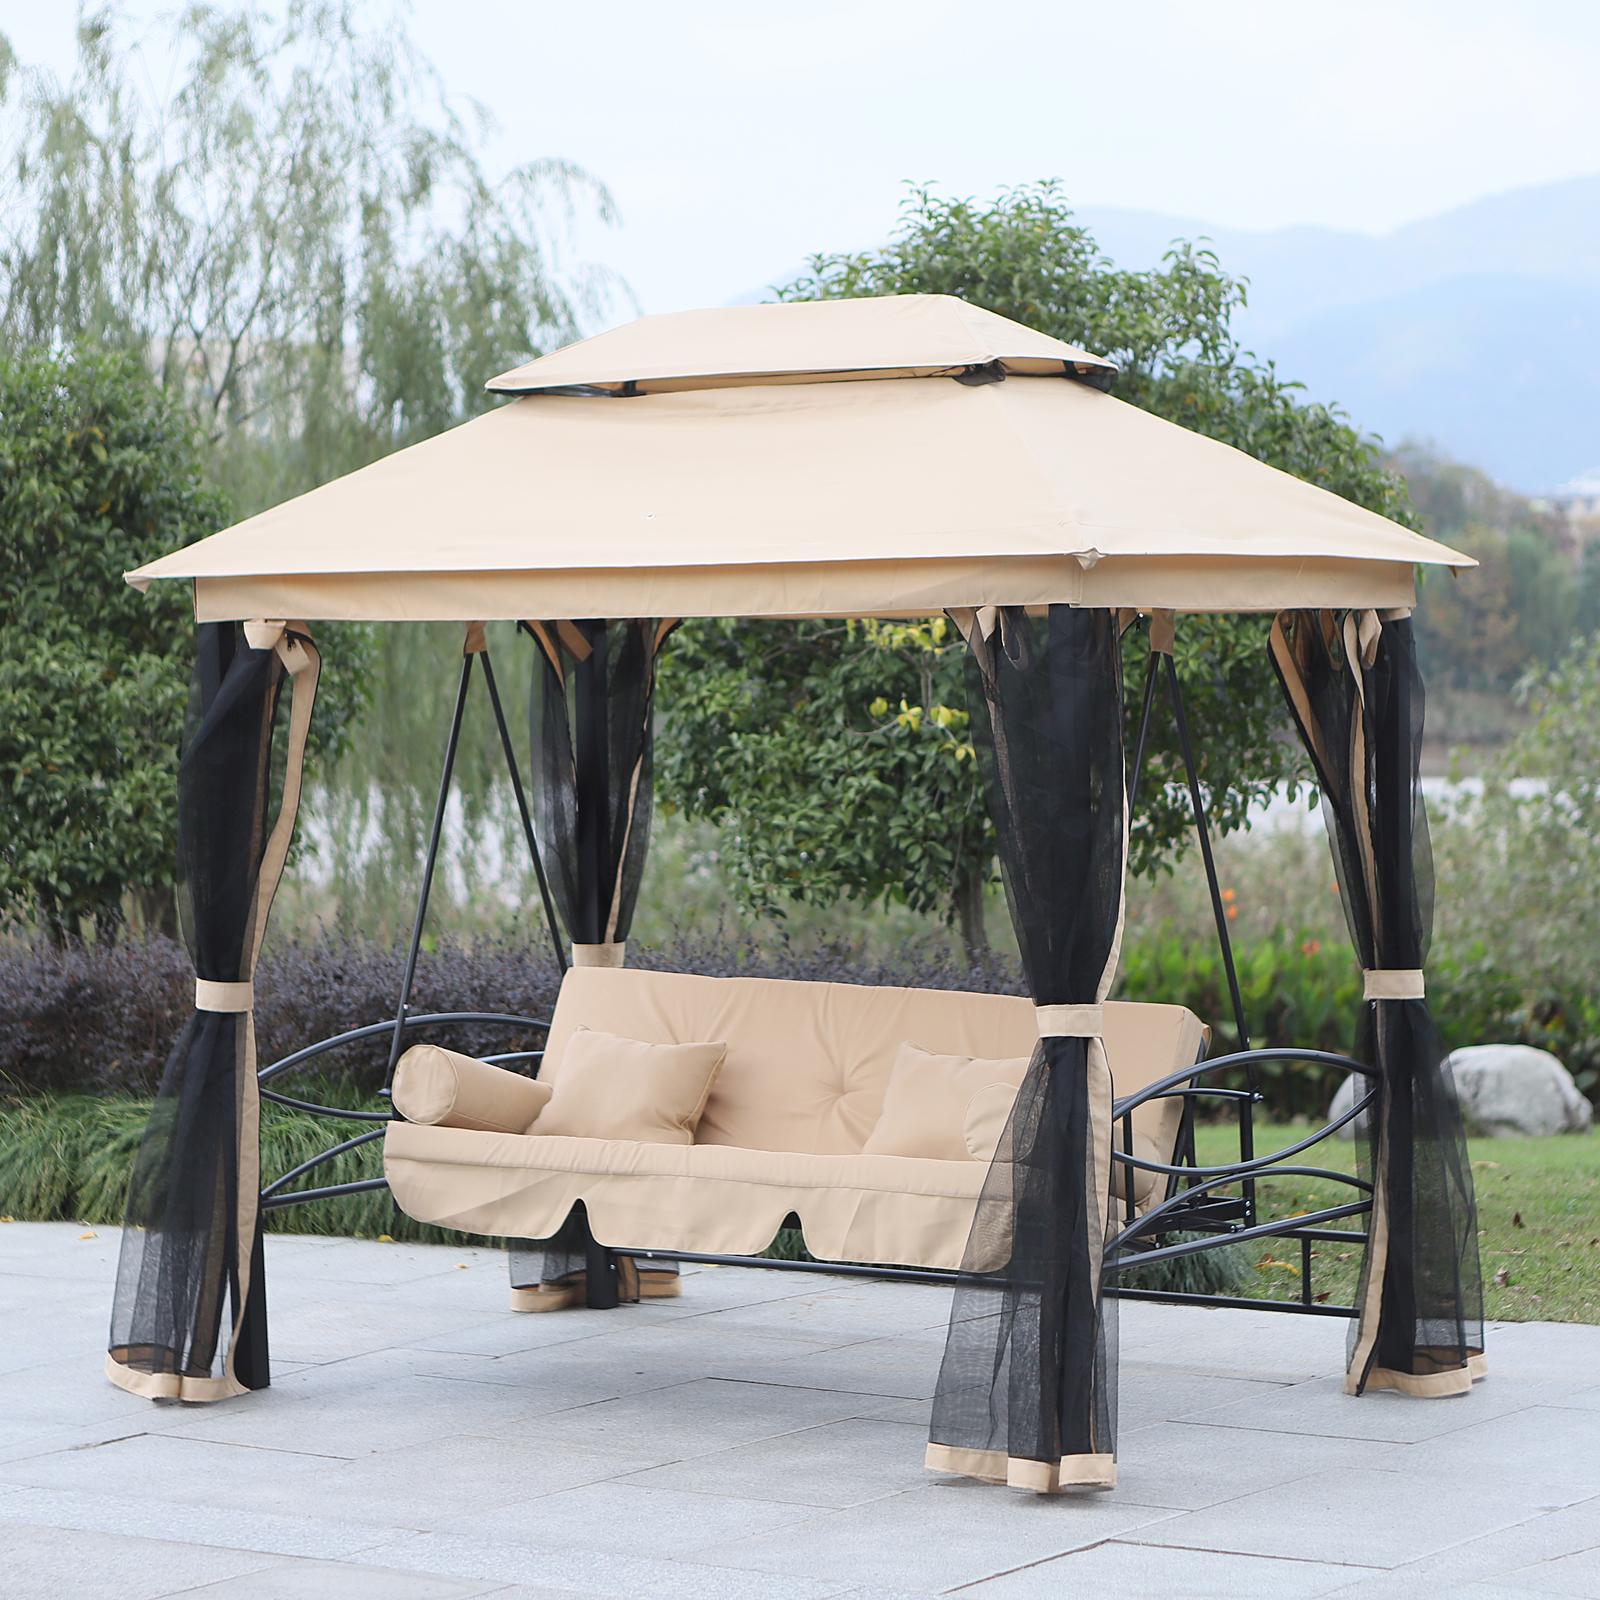 Heavy Duty Counter Stools, Outsunny 3 Seater Swing Hammock Garden Chair Bench Day Bed Canopy Gazebo Seat 5055974889811 Ebay